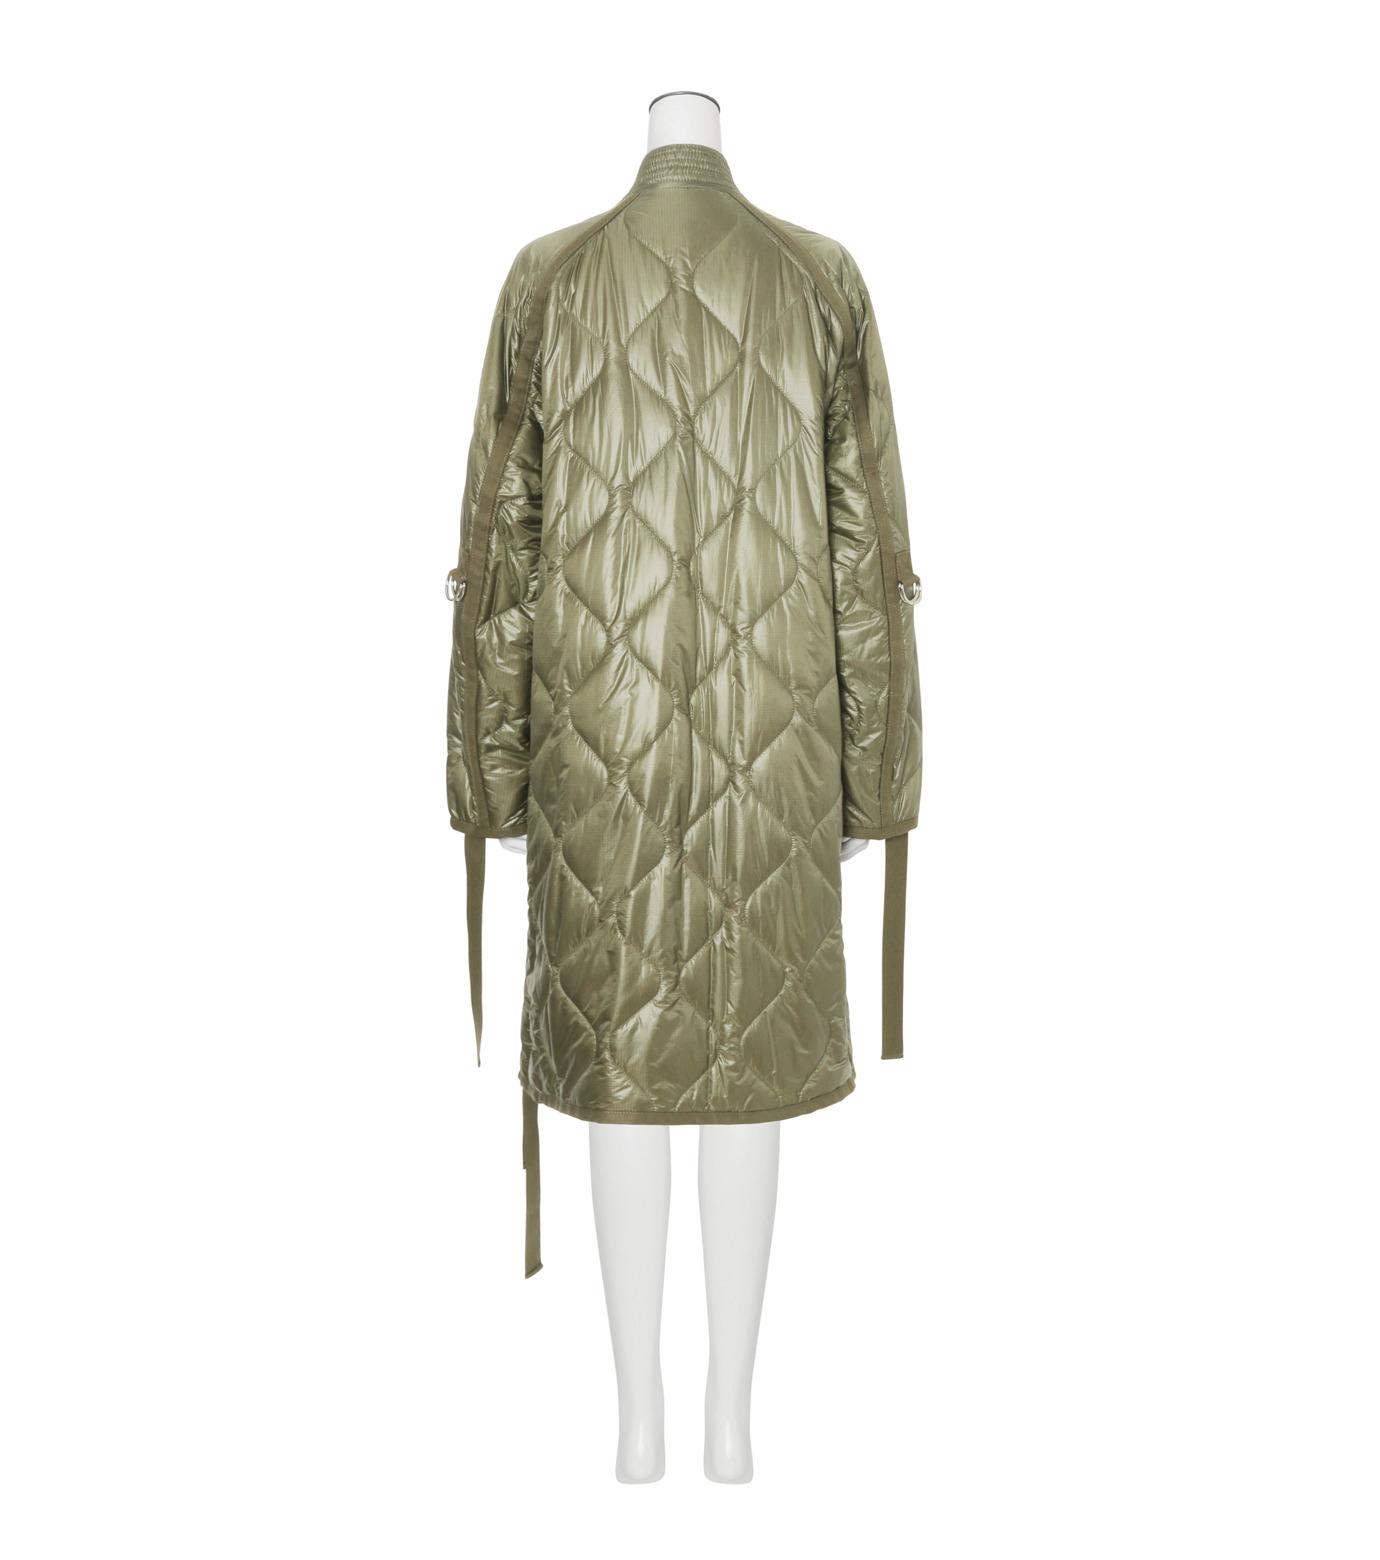 3.1 Phillip Lim(スリーワン フィリップリム)のLong Utility Kimono Jacket-KHAKI(コート/coat)-F161-8326RSN-24 拡大詳細画像2